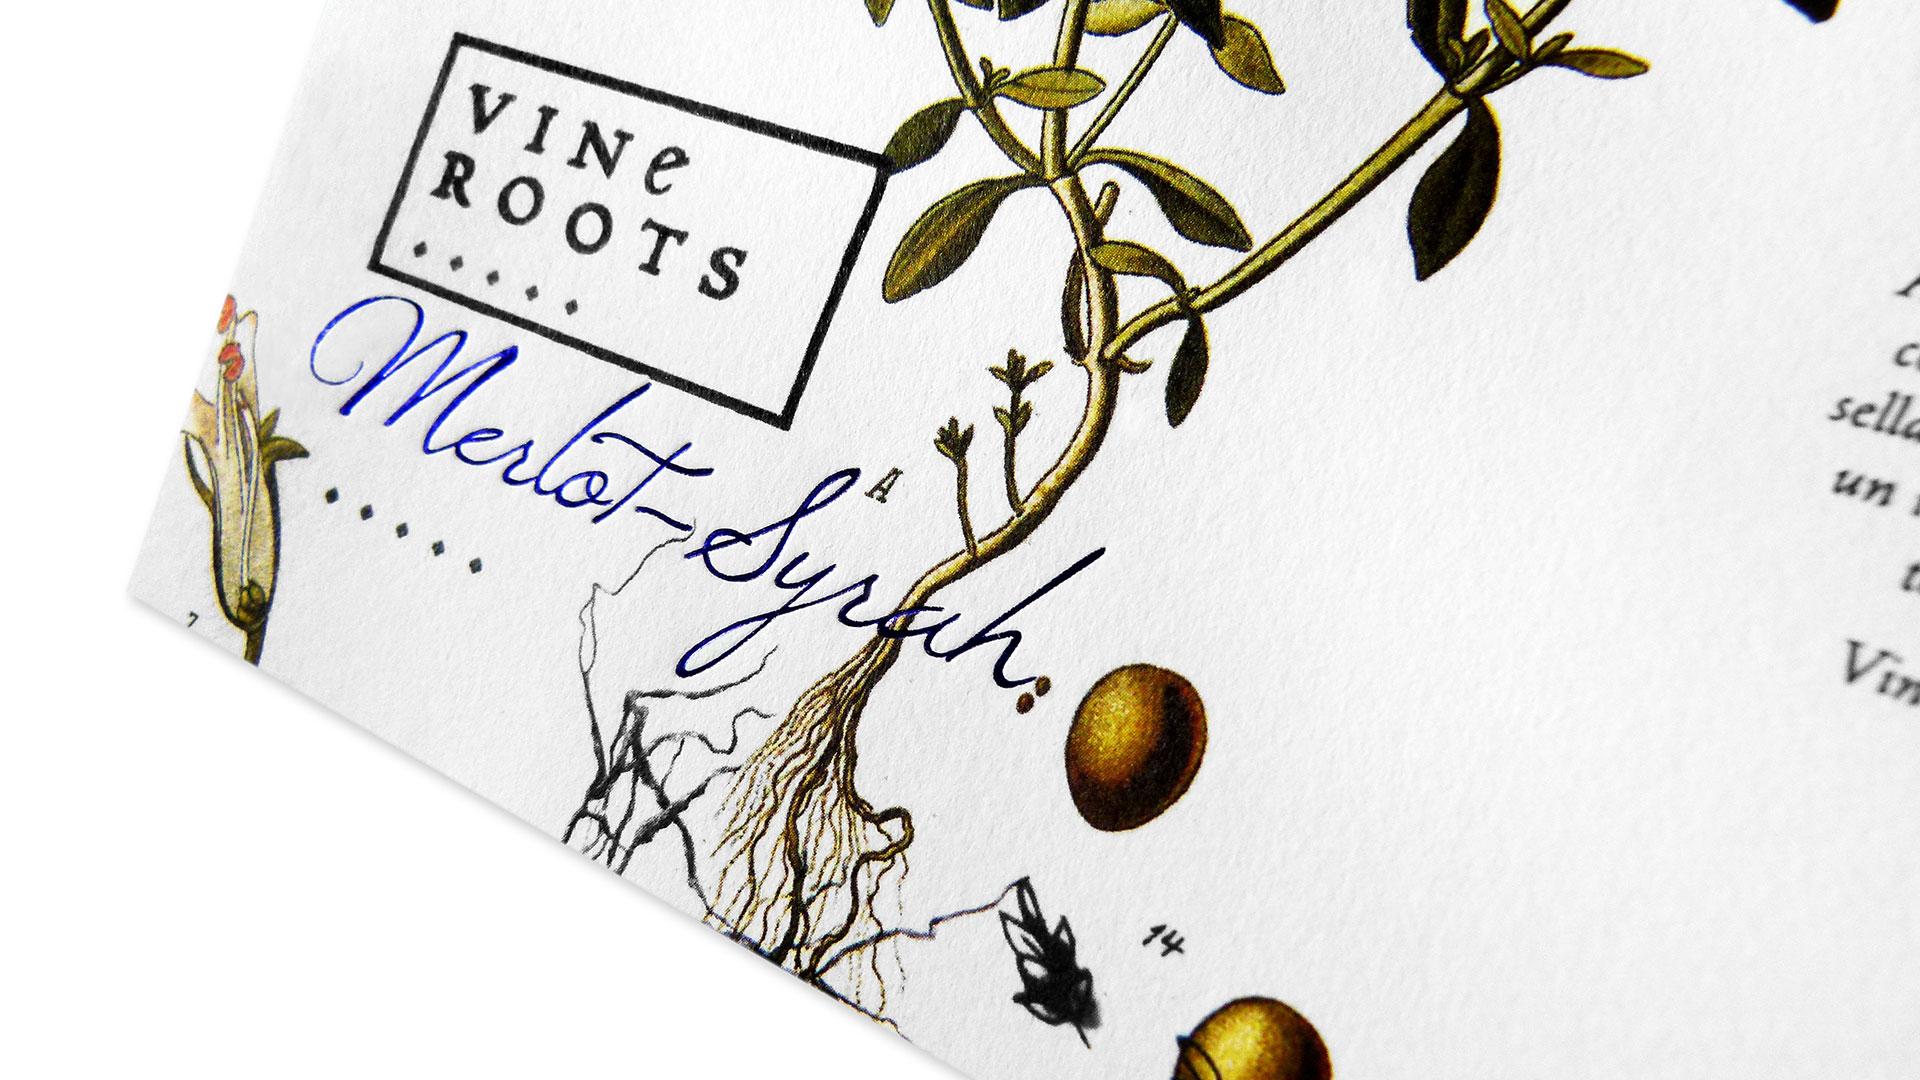 784-vine-roots-1